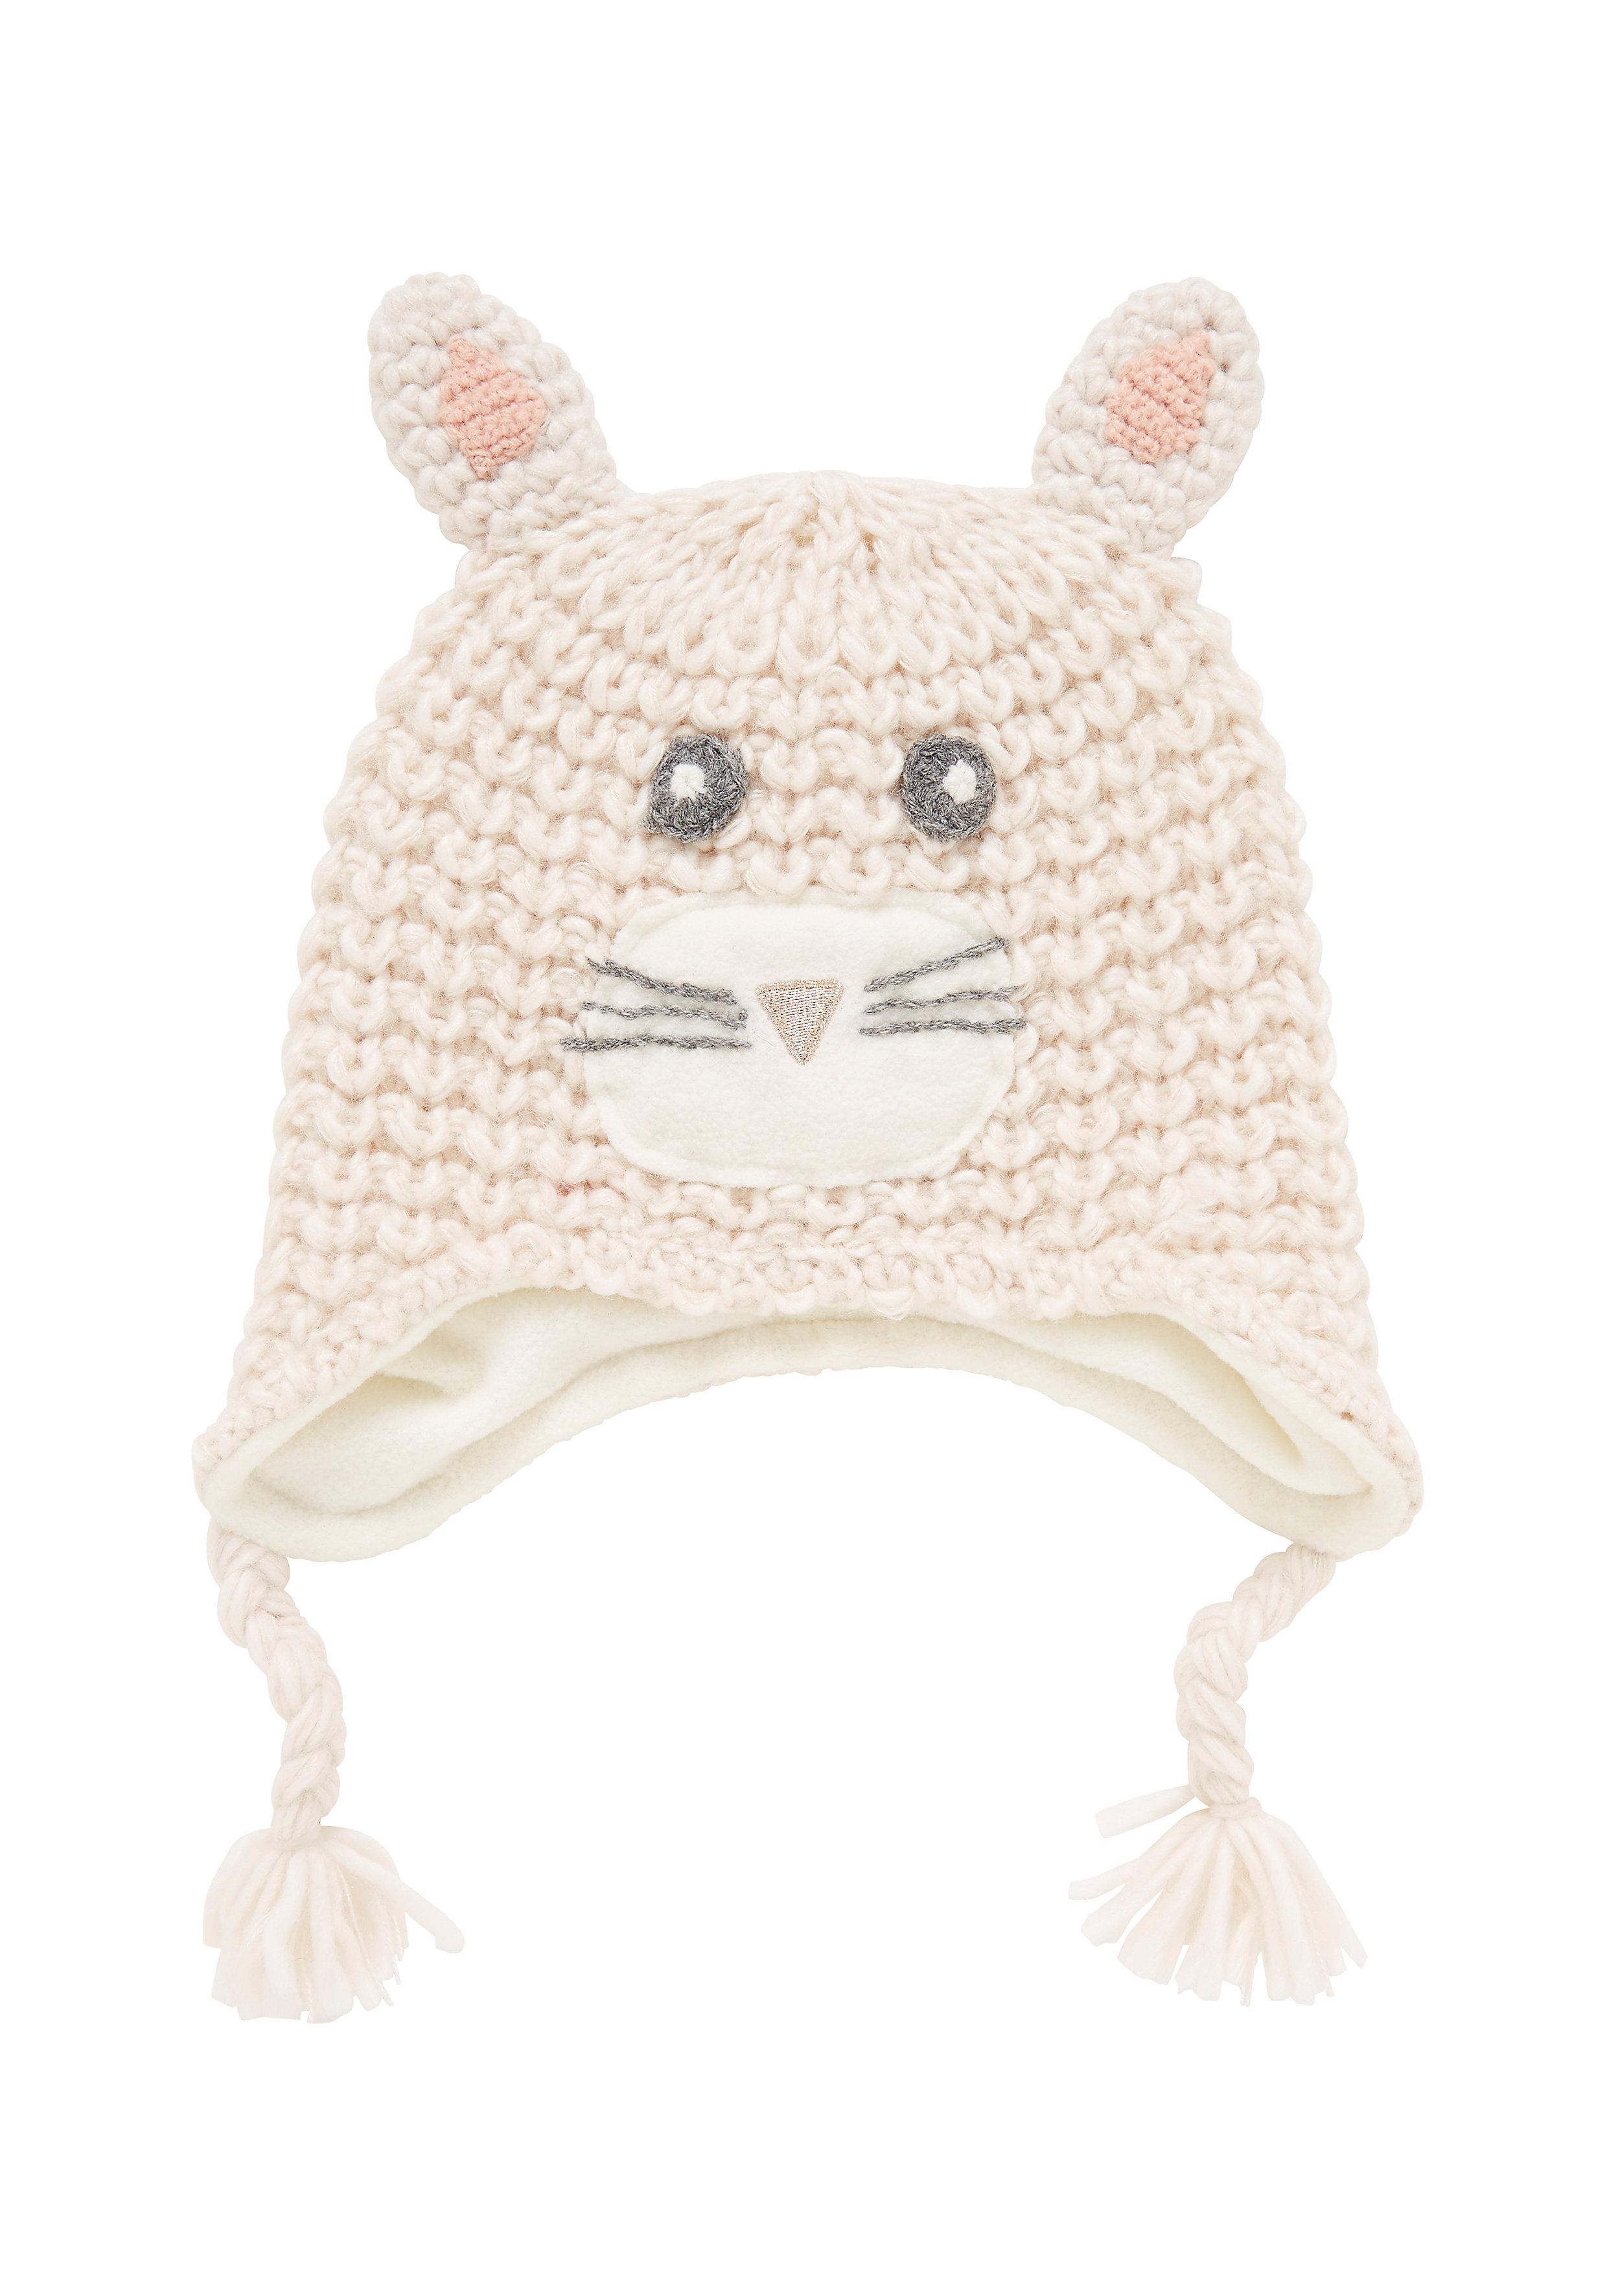 Mothercare | Girls Hat 3D Ear Detail - Cream